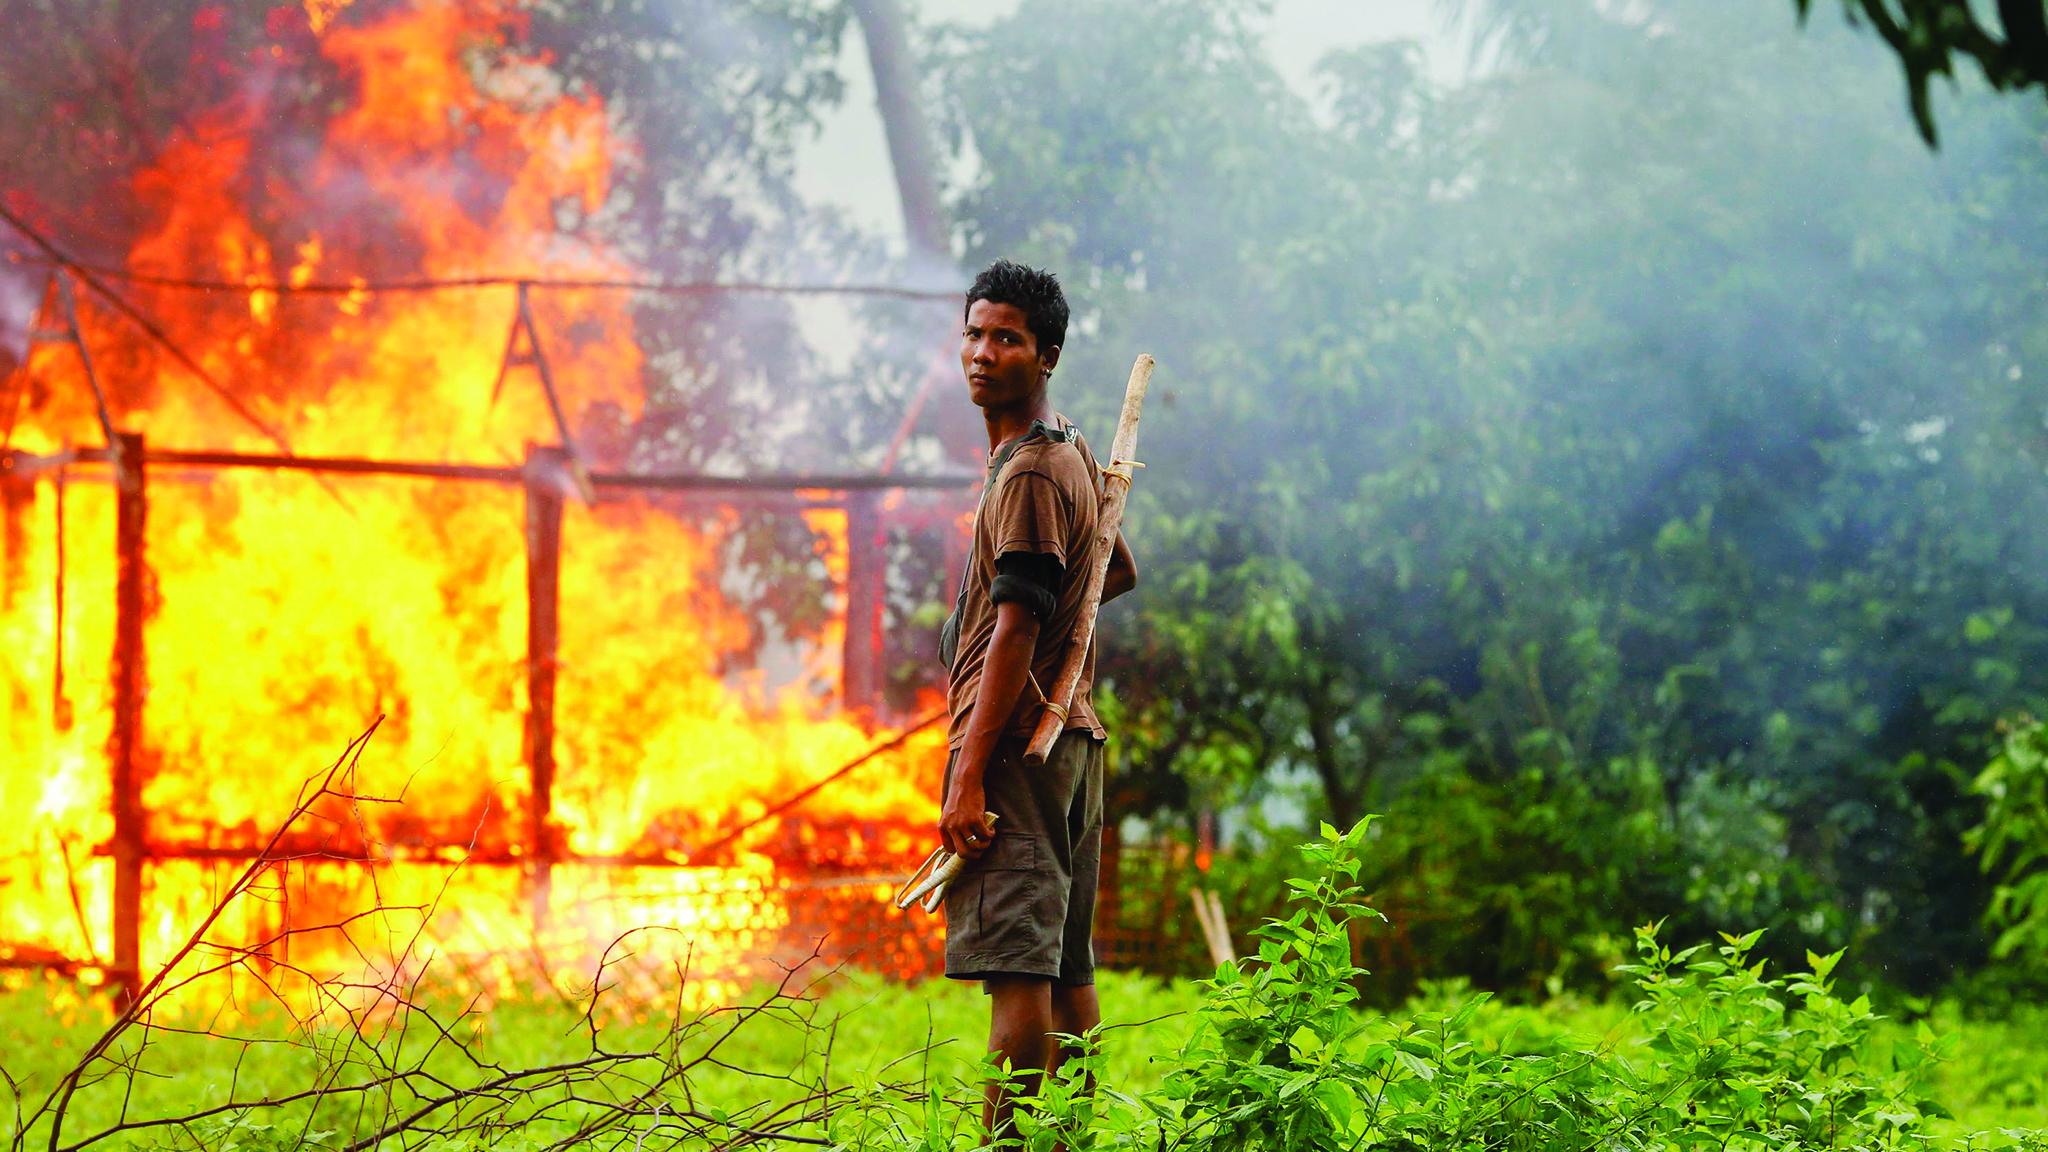 Birmânia | Rebeldes rohingya rejeitam autoria de massacre de hindus